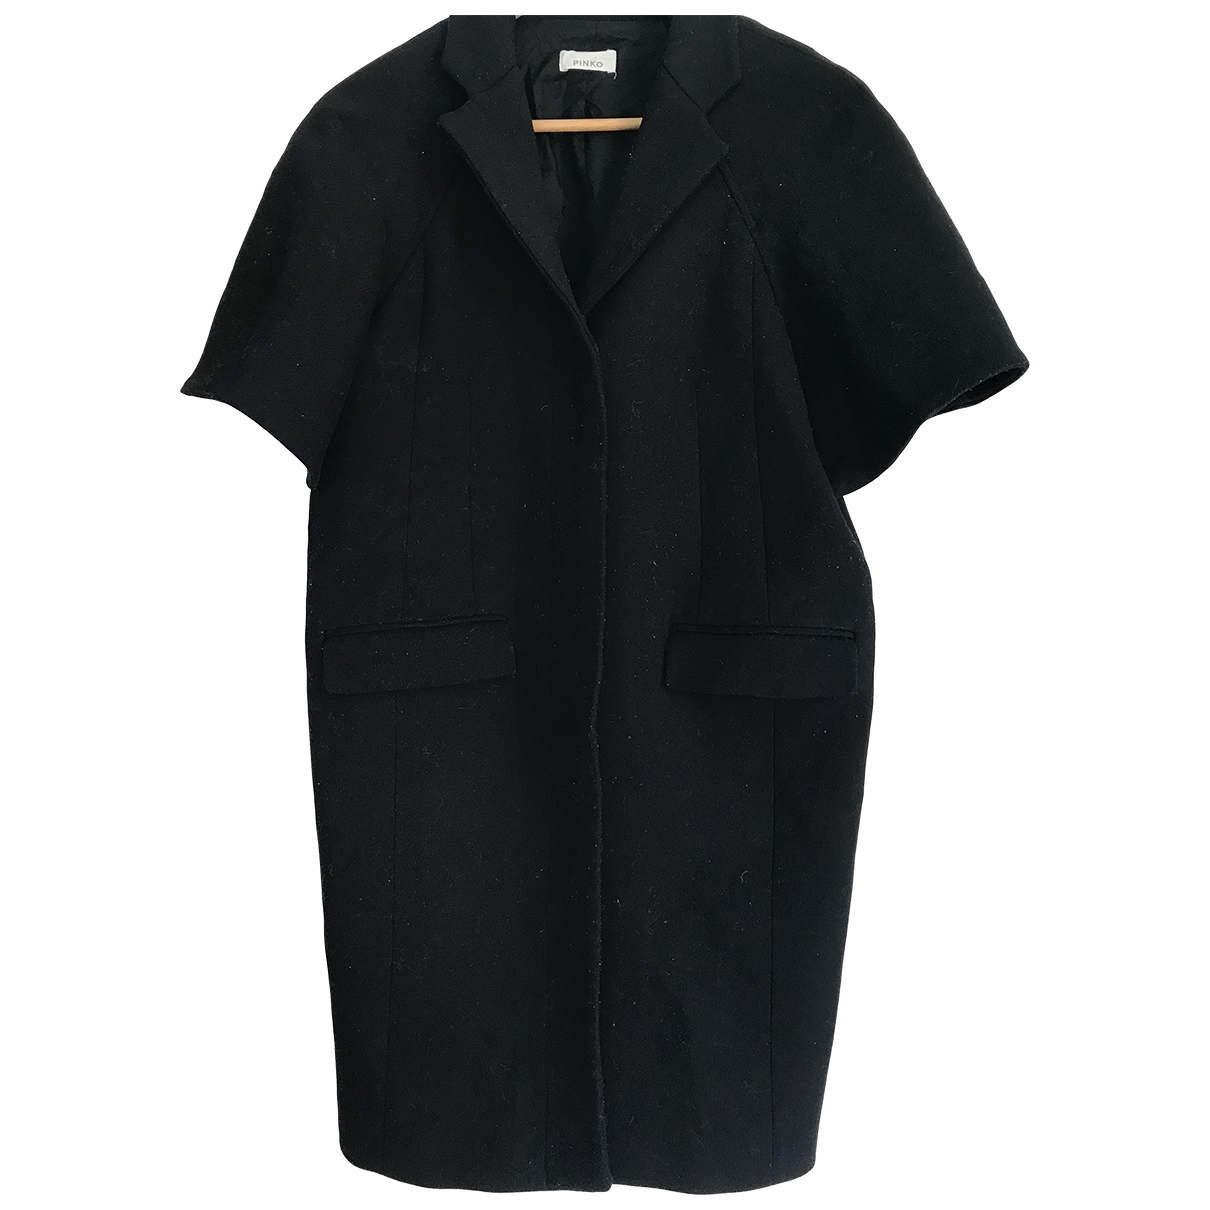 Pinko \N Black Cotton - elasthane dress for Women 40 FR